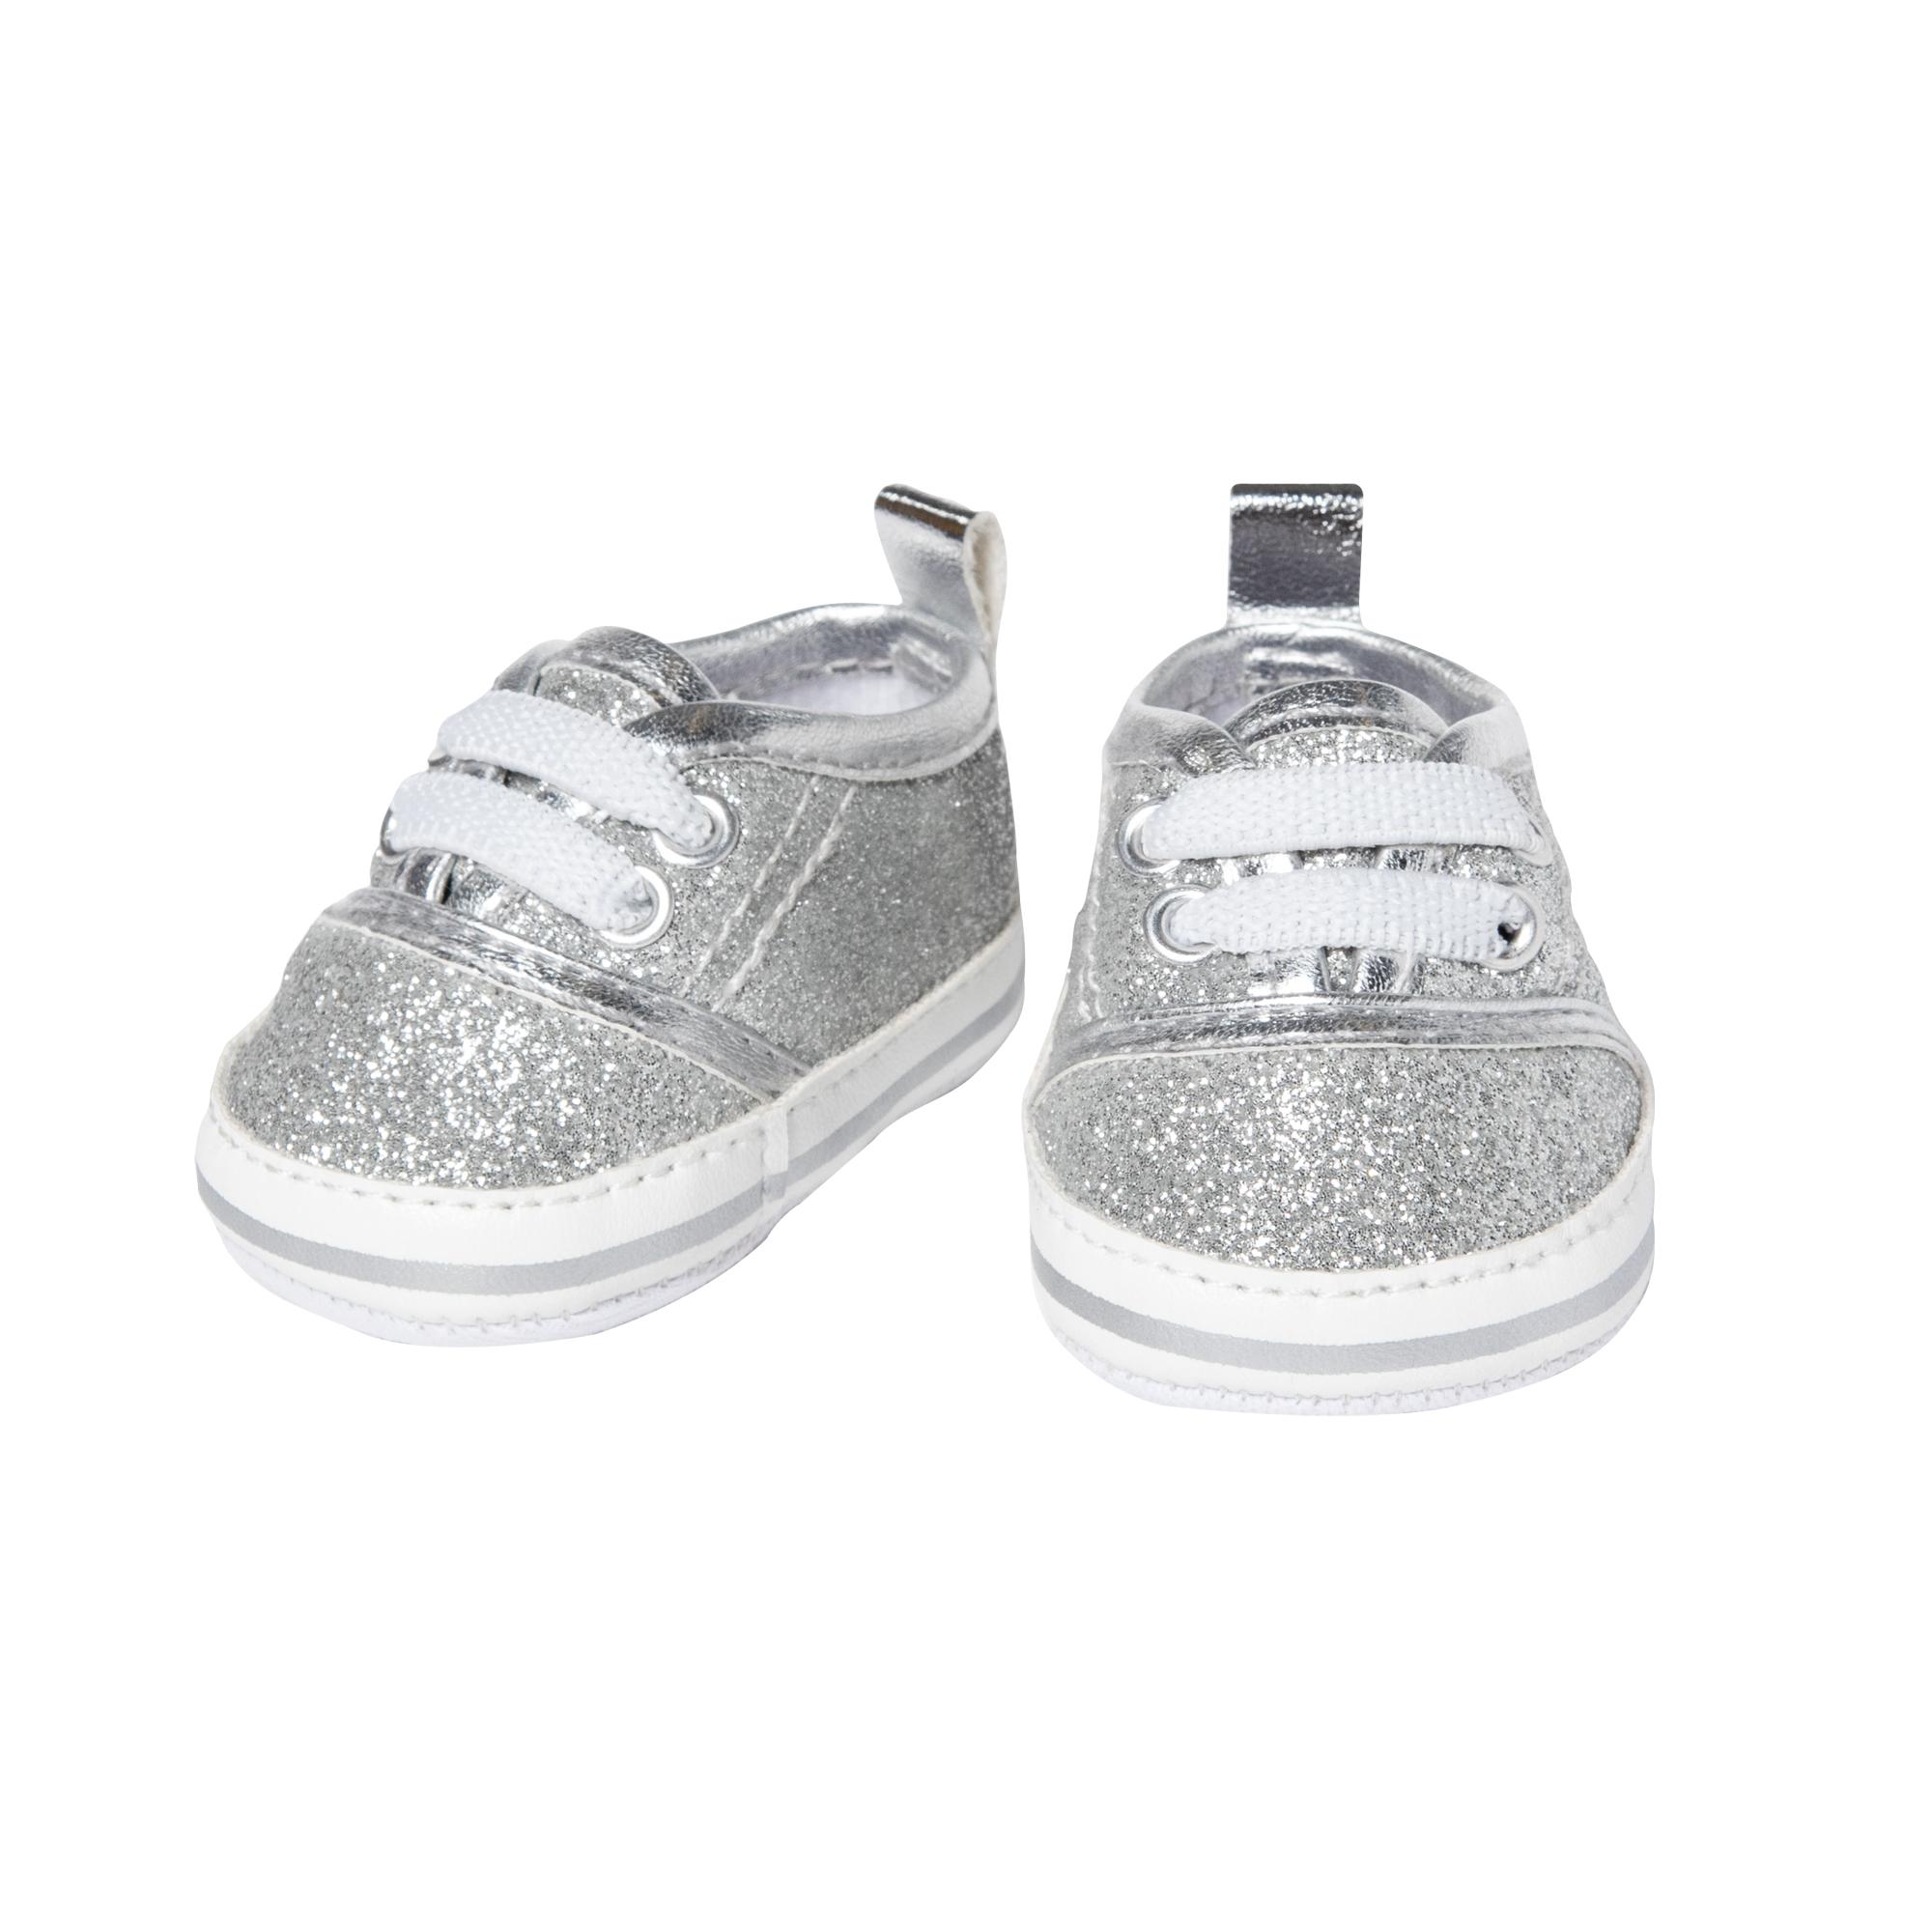 Glitzer-Sneakers, silber, Gr. 38-45 cm